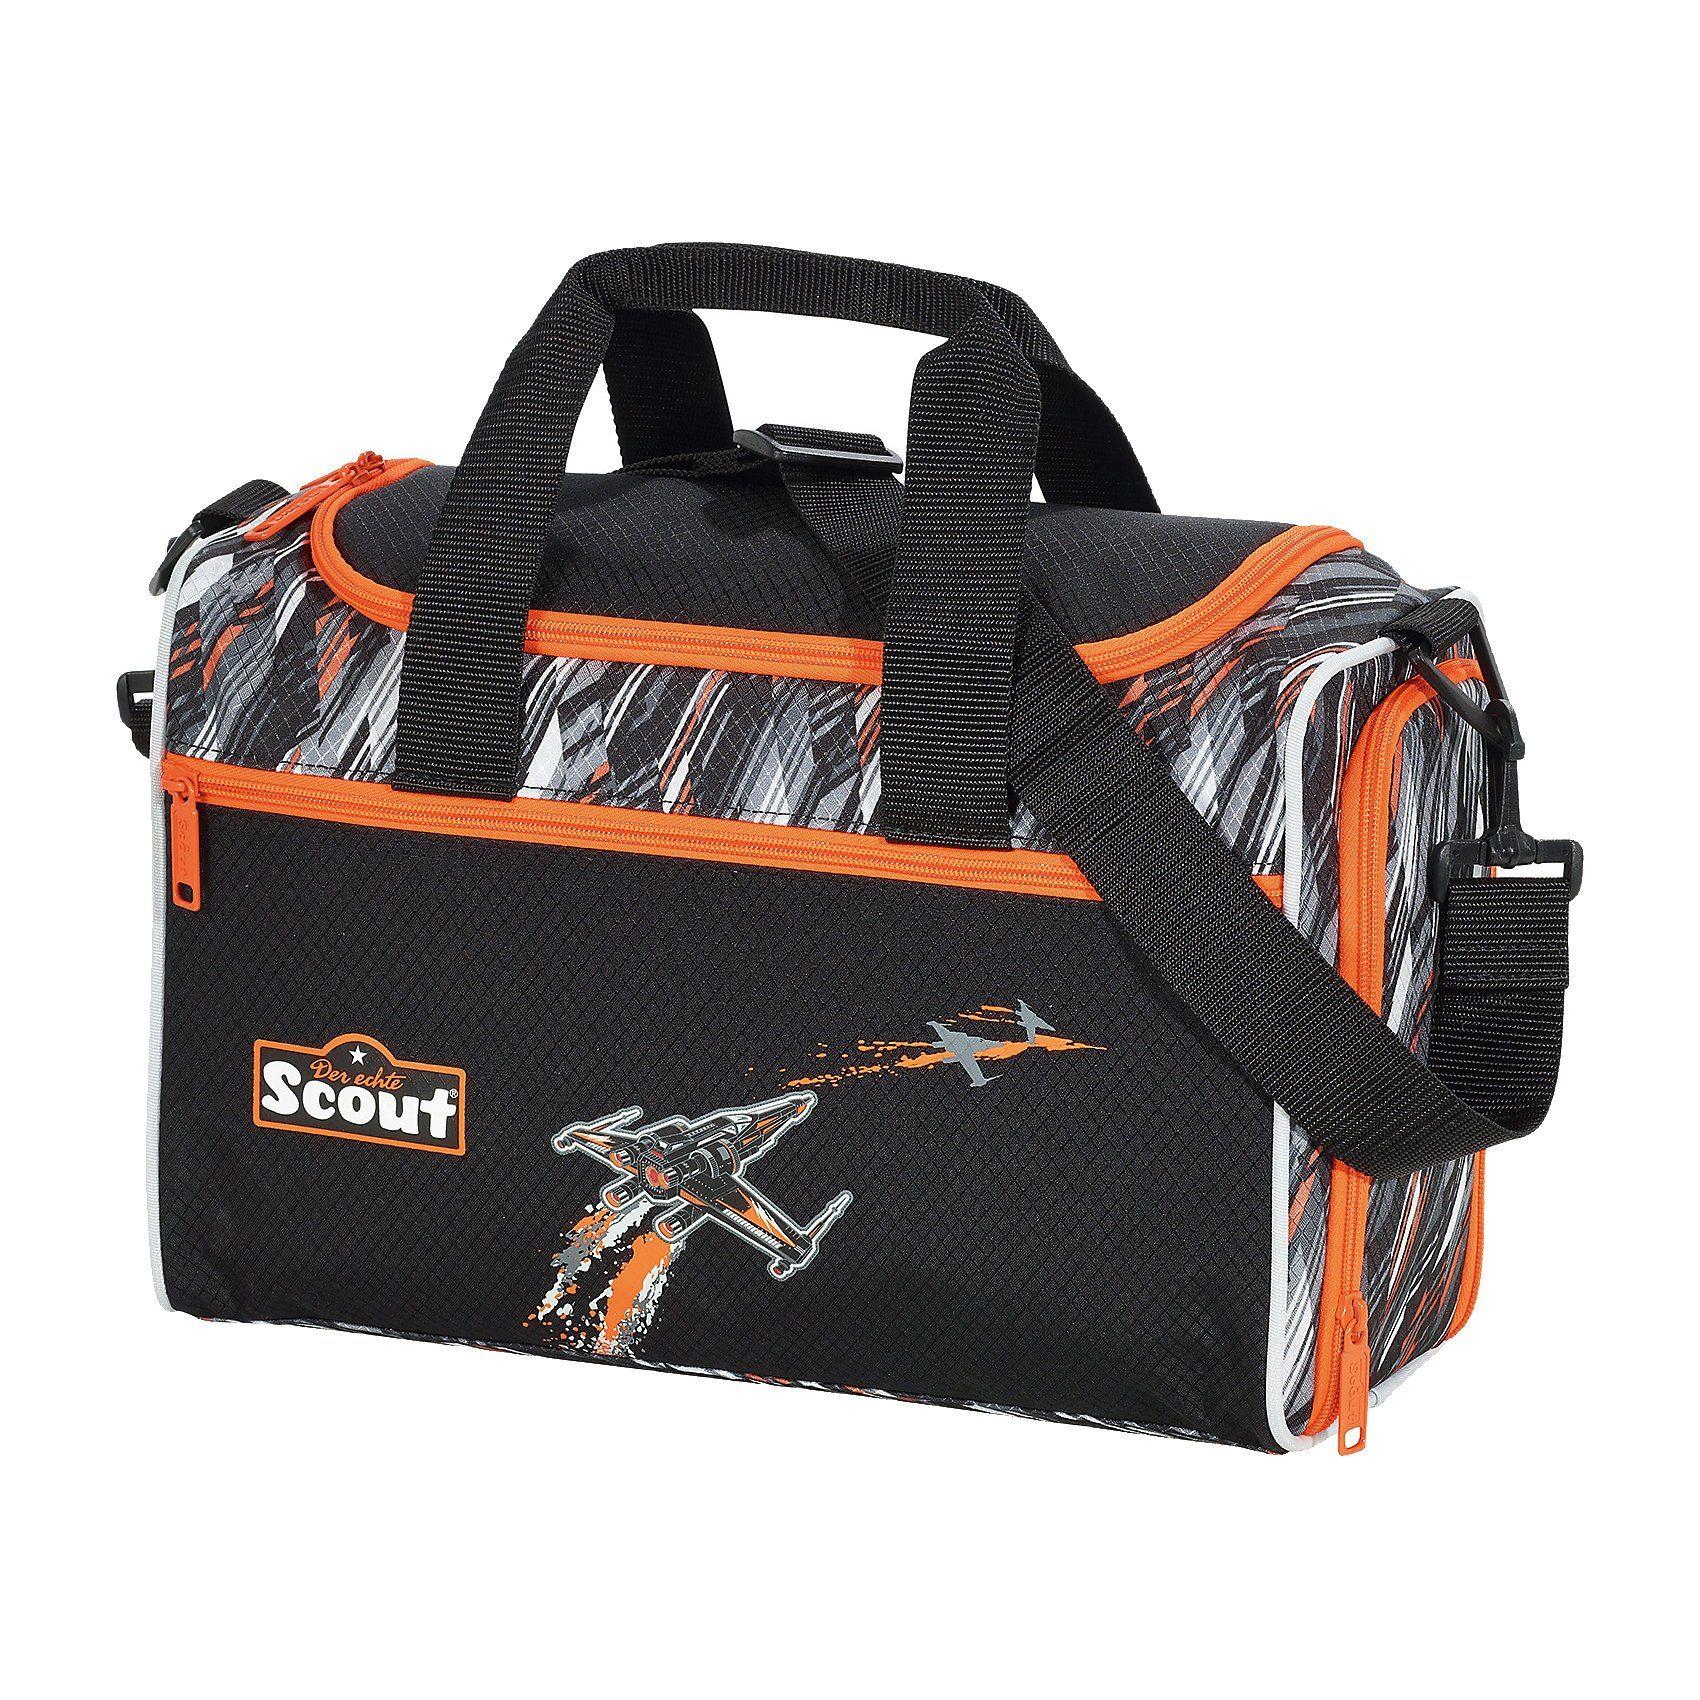 Scout Sporttasche IV Commander